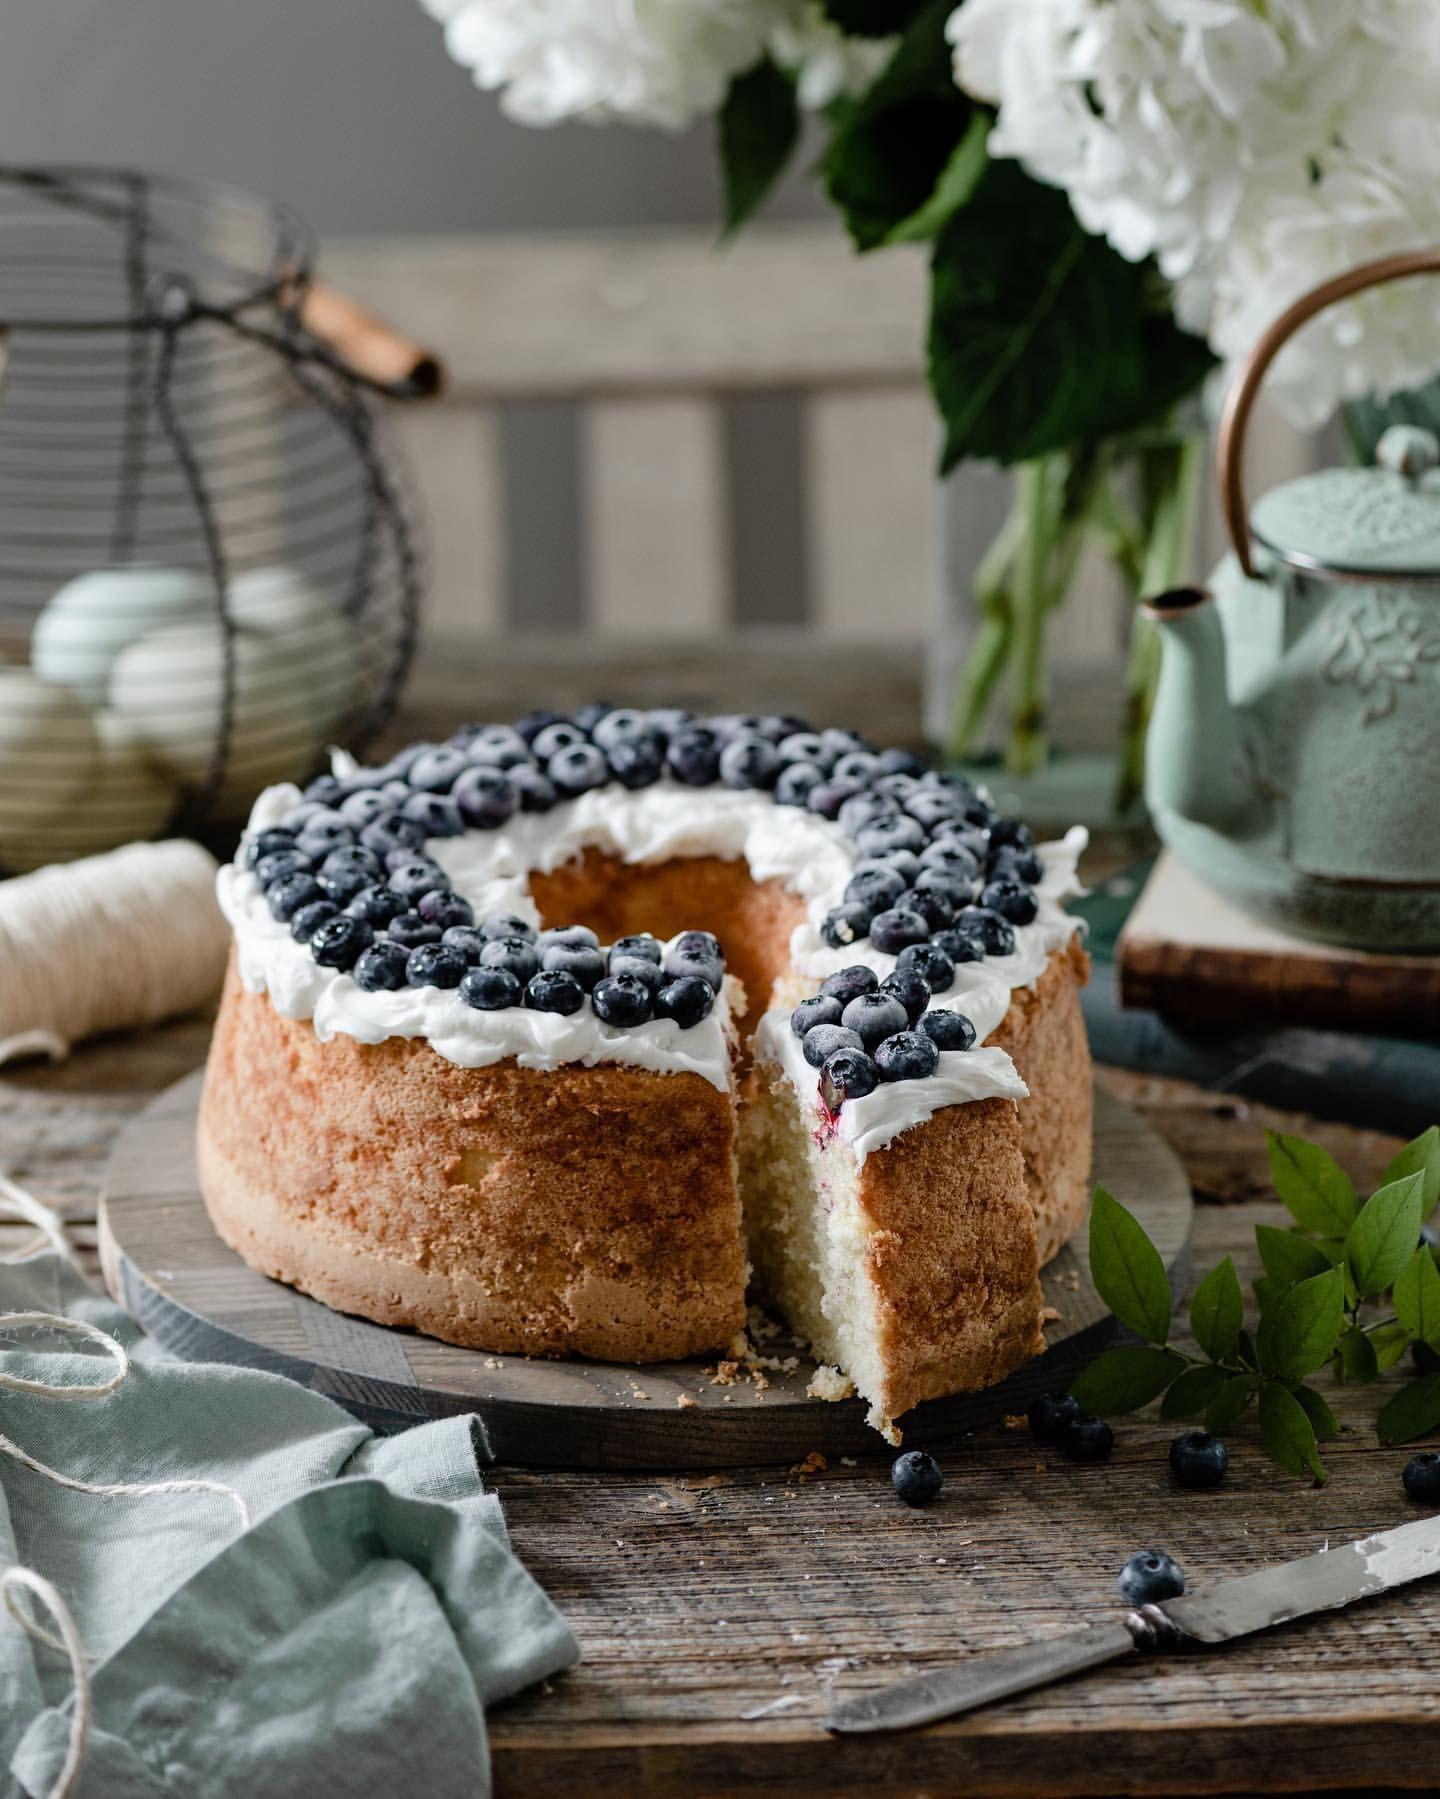 Vanilla Pound Cake with Blueberries